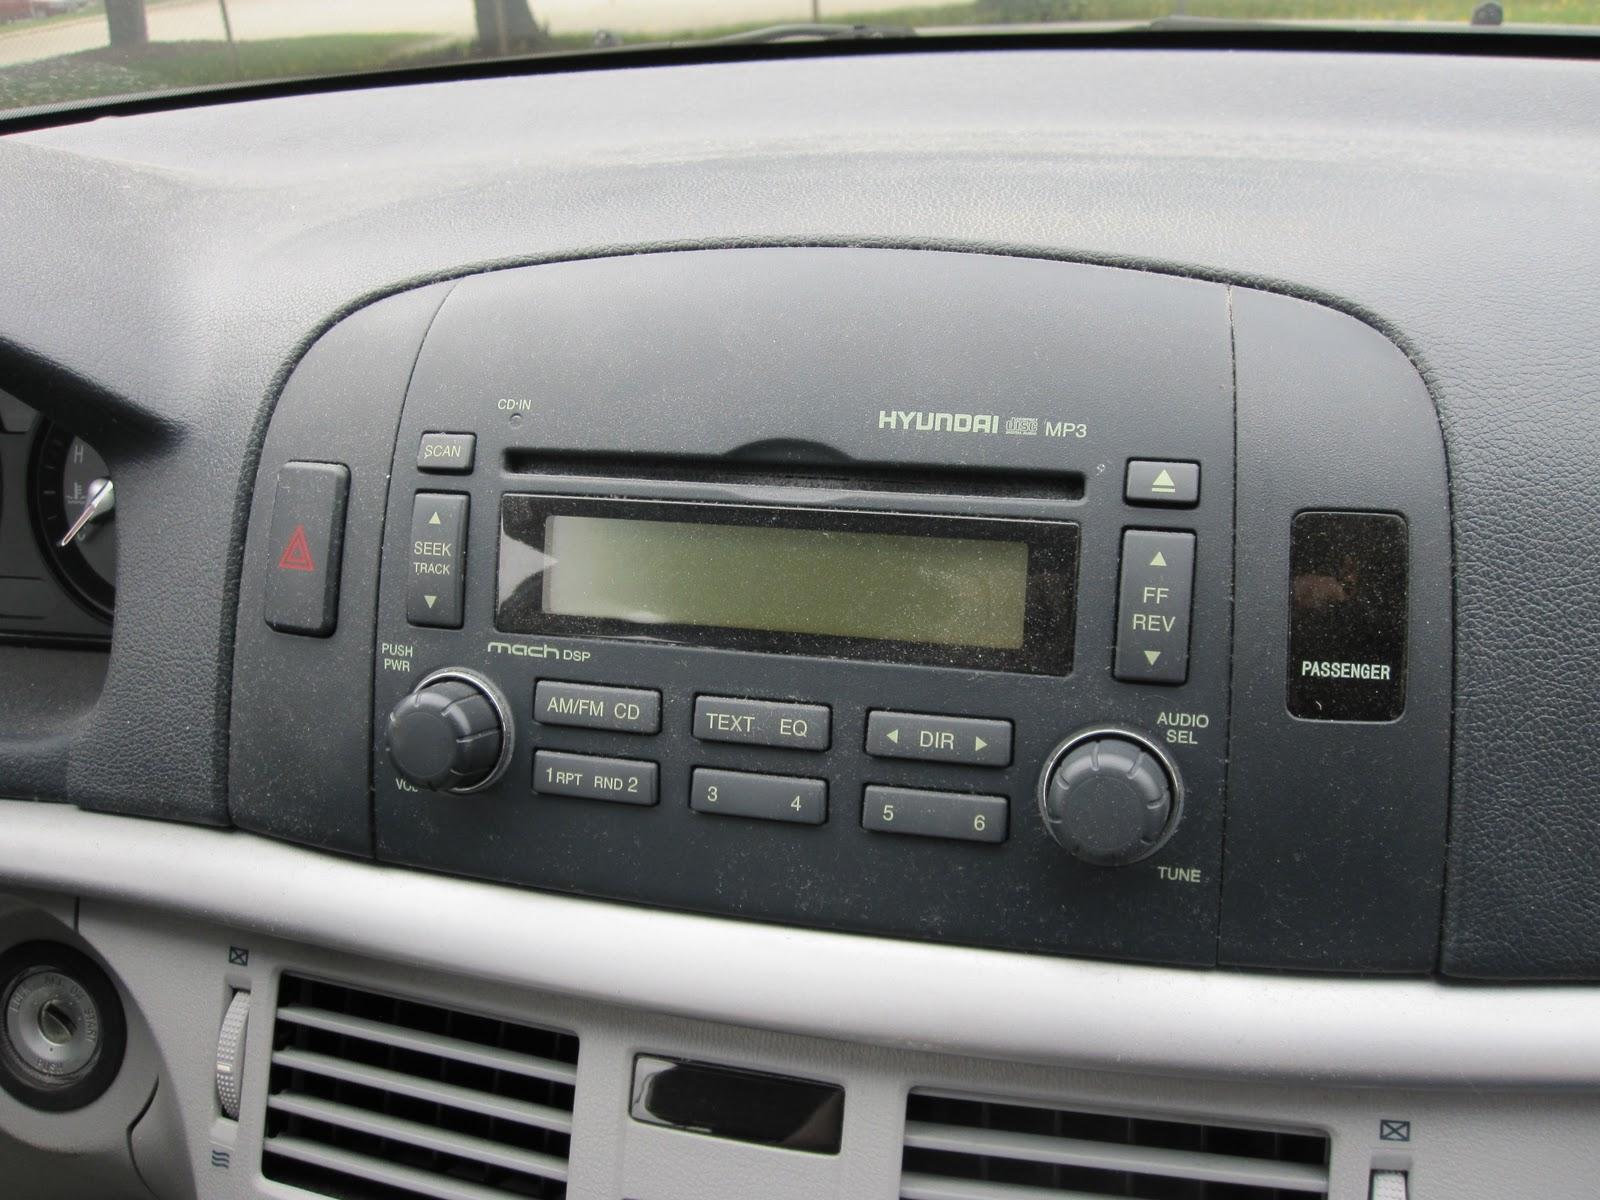 Hyundai Sonata Radio Wiring Diagram 3 Phase Dol Starter Control 2007 Aux Input Jon Don T Do It